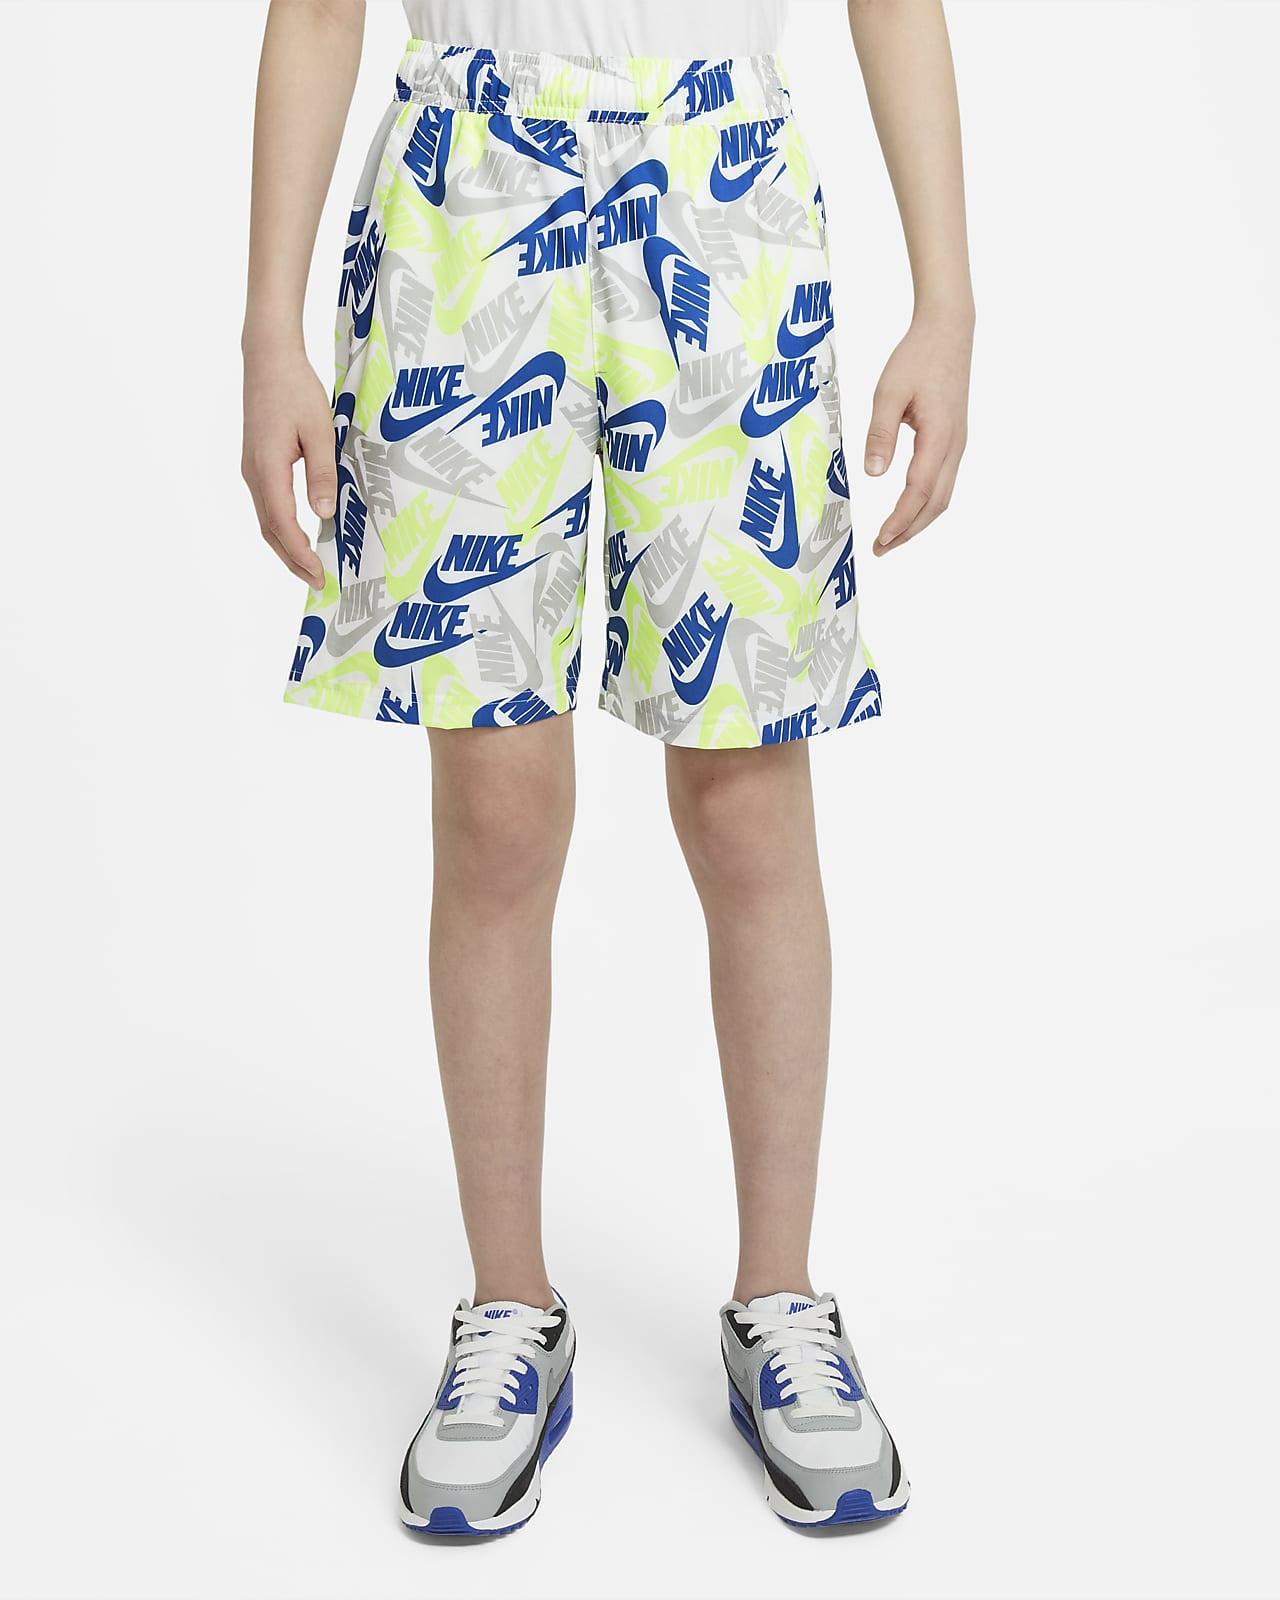 Nike Sportswear Older Kids' (Boys') Printed Woven Shorts